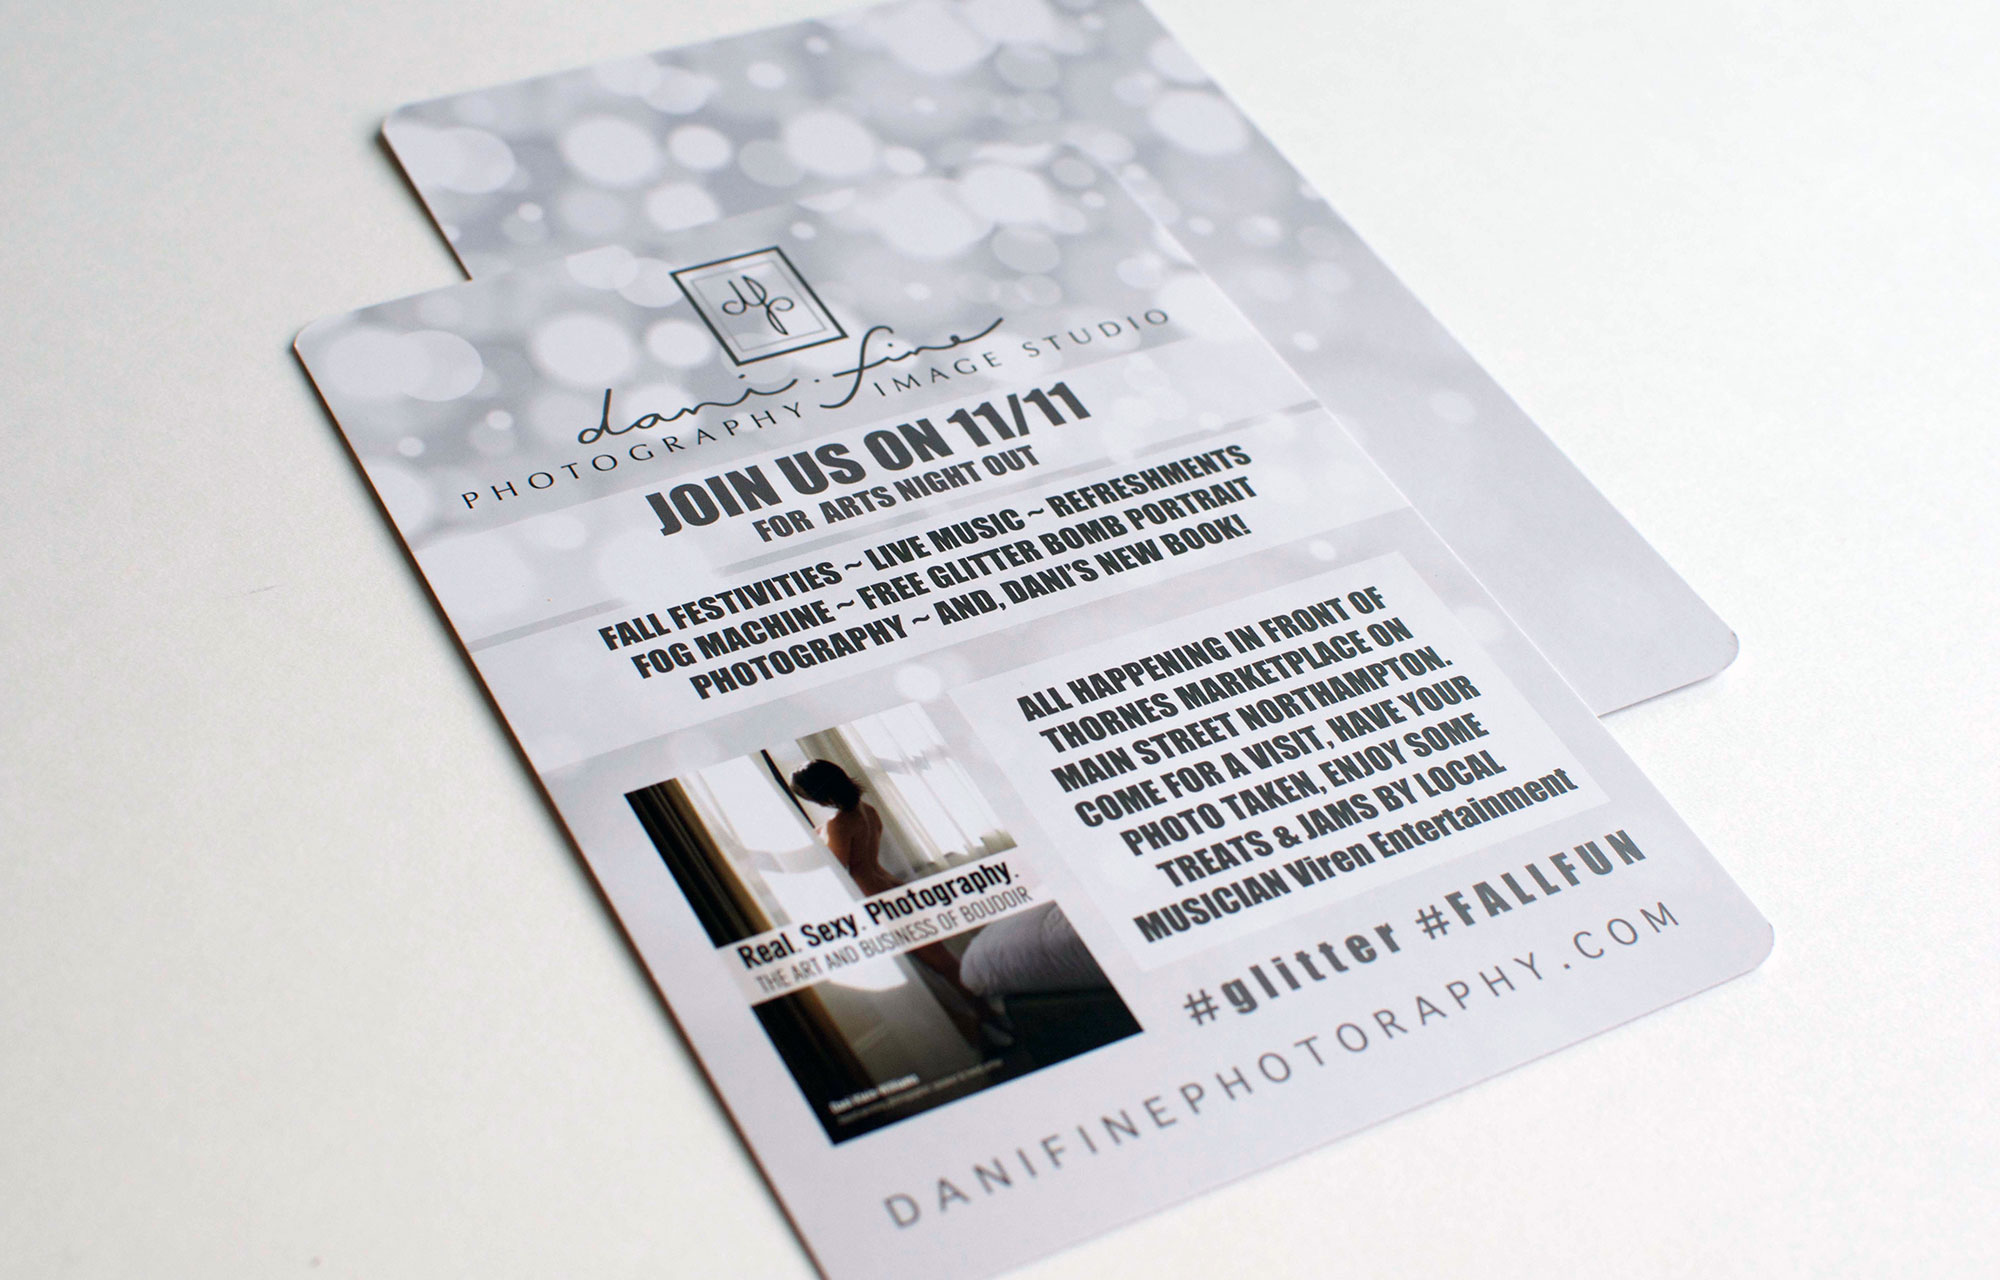 post card design by megan alissa, meganalissa.com, graphic designer in Northampton MA, graphic design, print design, postcard design, marketing design